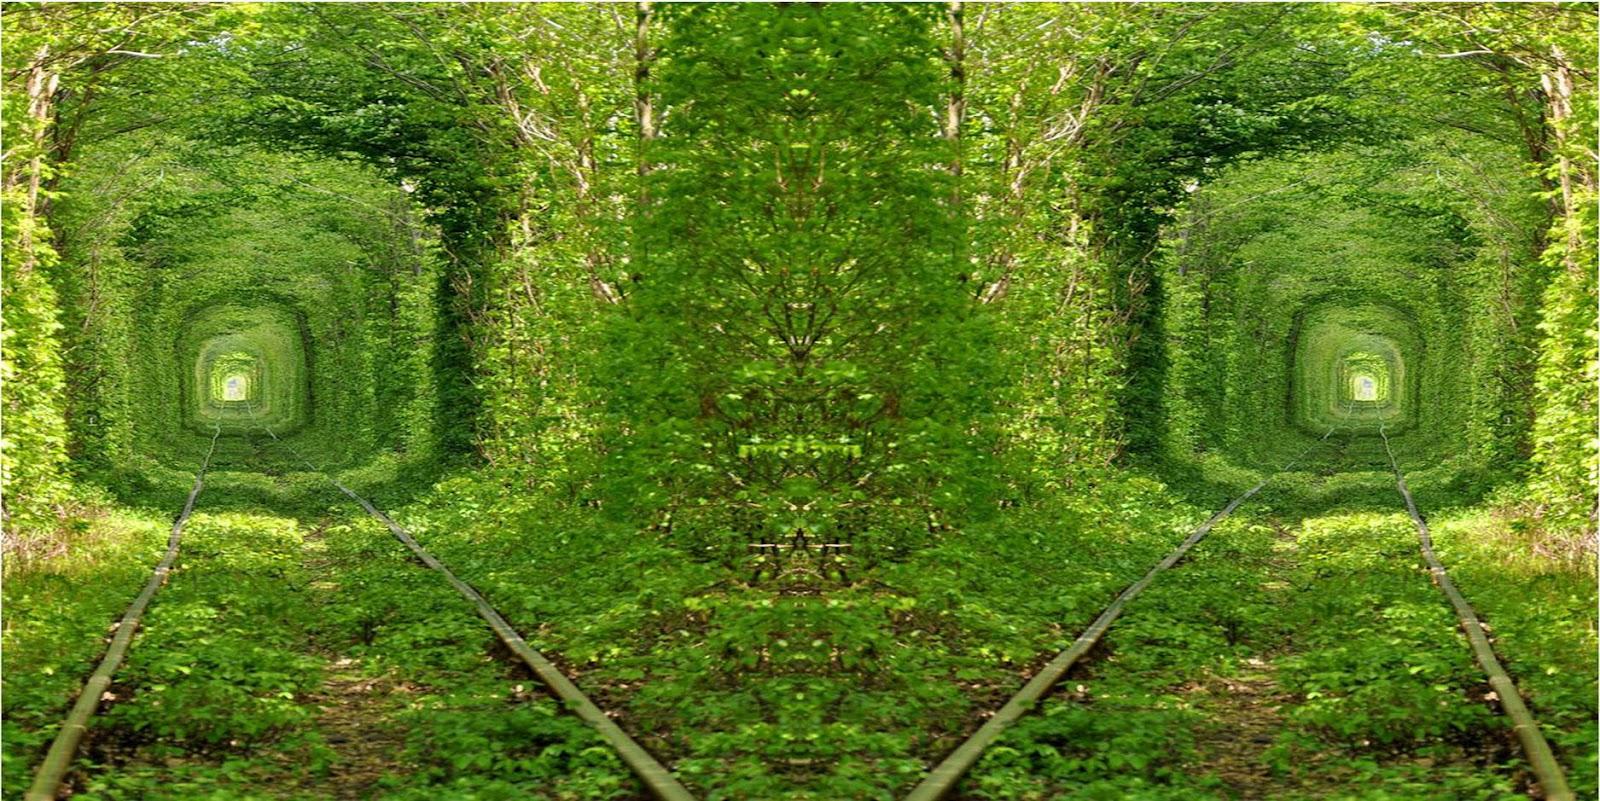 Most Inspiring Wallpaper High Resolution Widescreen - beautiful-green-tunnel-nature-background-wallpaper-for-laptop-widescreen  Pictures_6178100.jpg